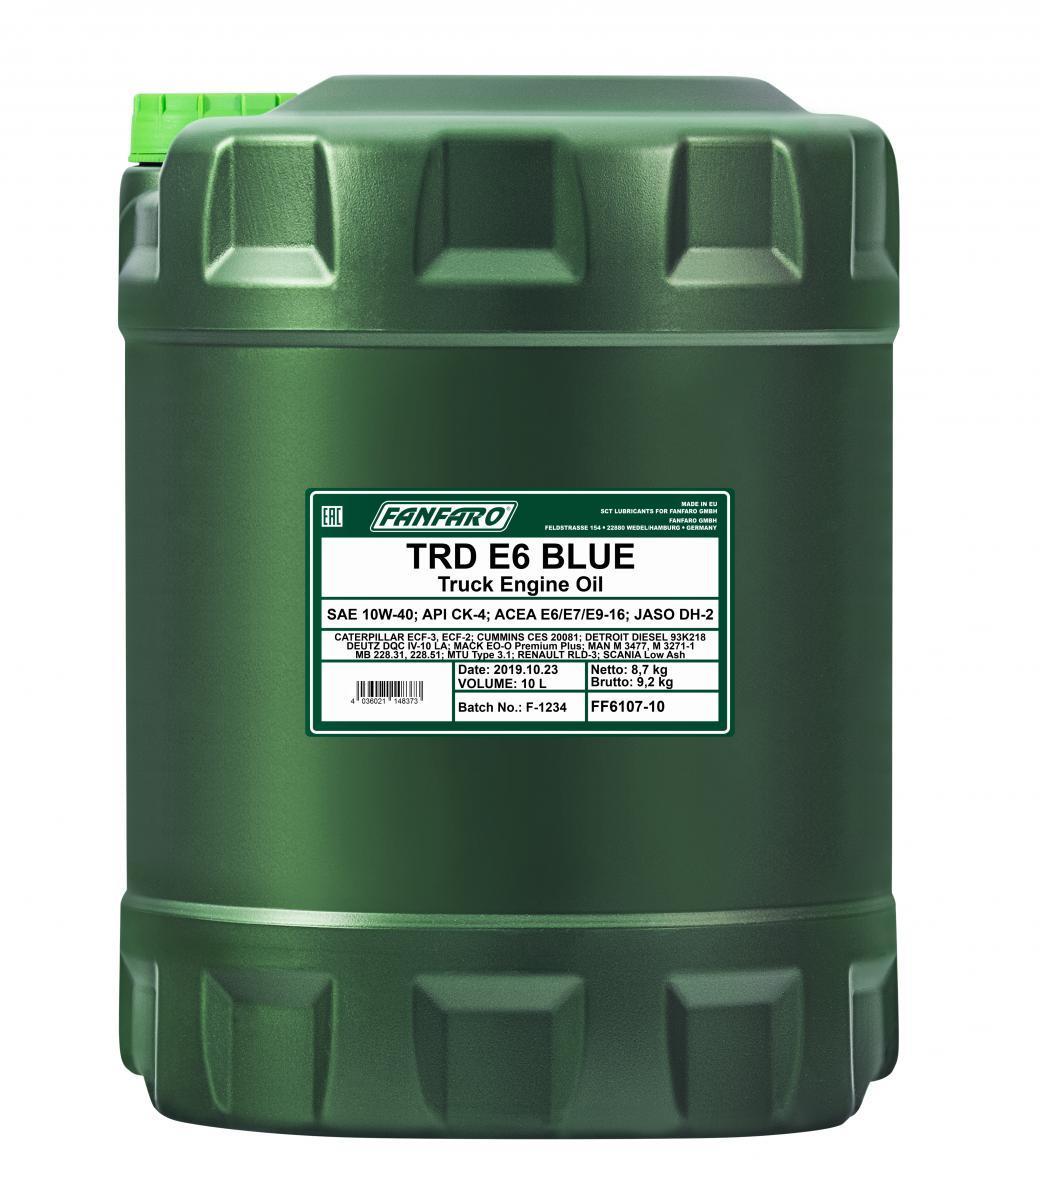 FF6107-10 FANFARO UHPD, TRD E6 Blue 10W-40, 10l, Synthetiköl Motoröl FF6107-10 günstig kaufen